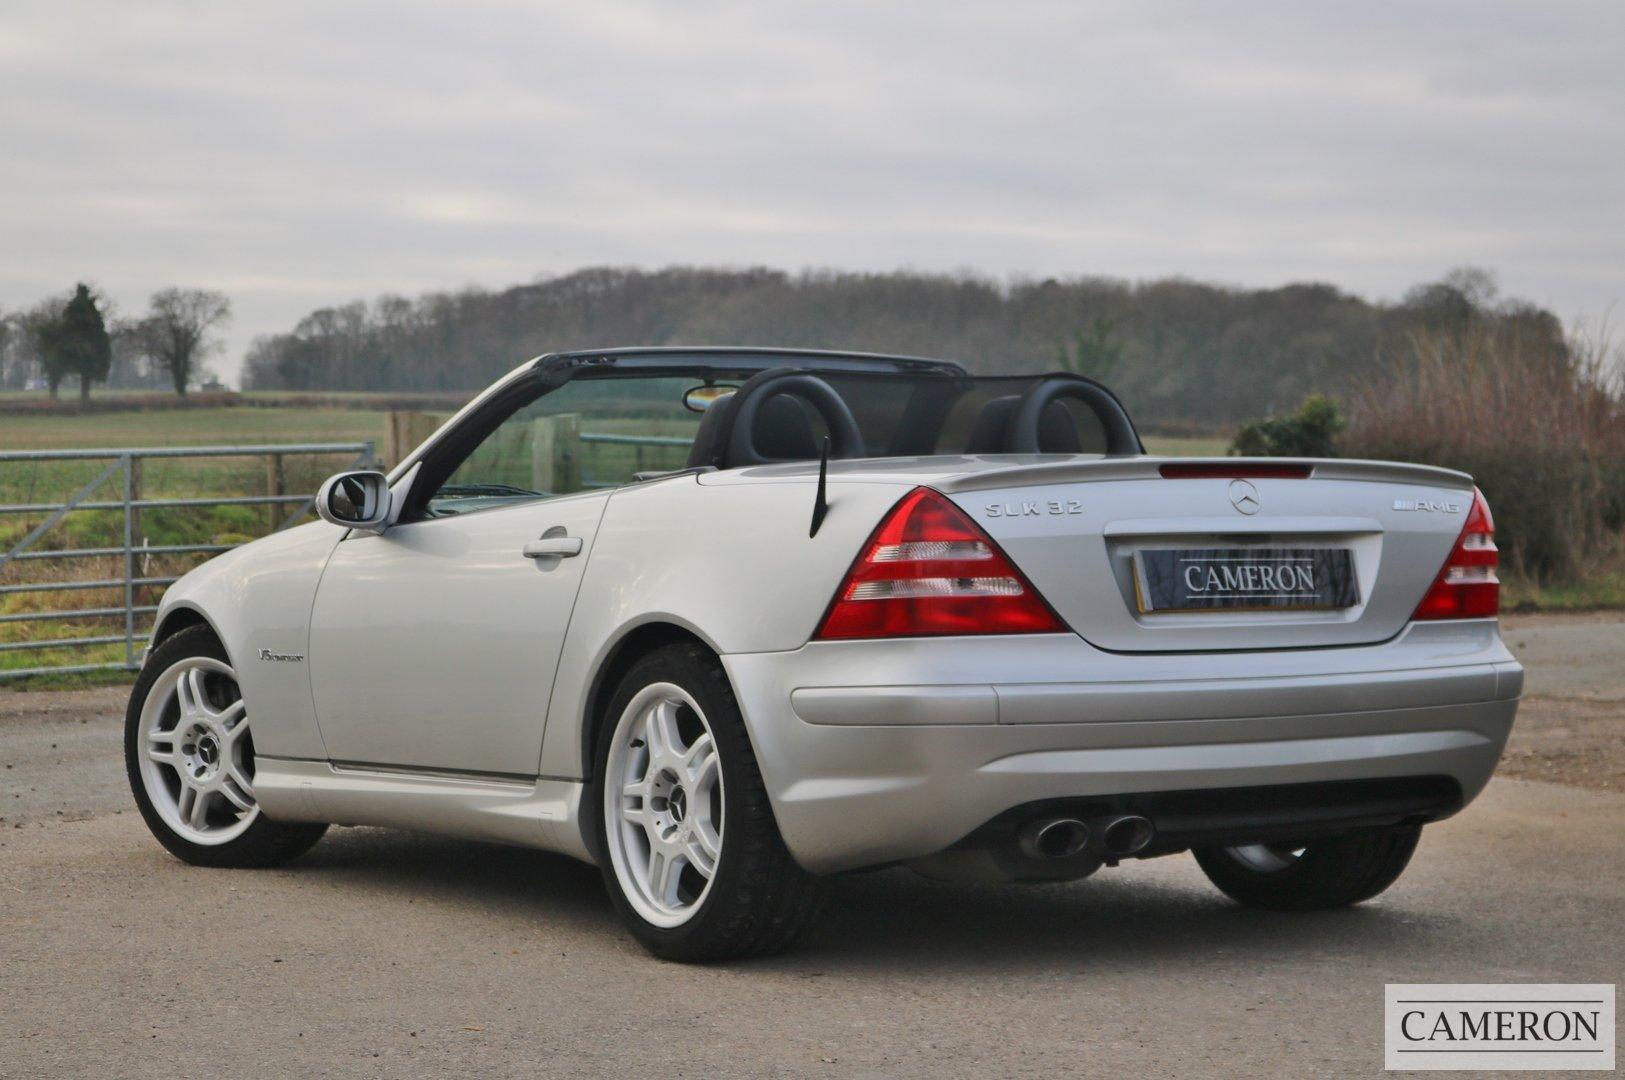 2003 Mercedes Benz SLK 32 AMG  For Sale (picture 2 of 6)